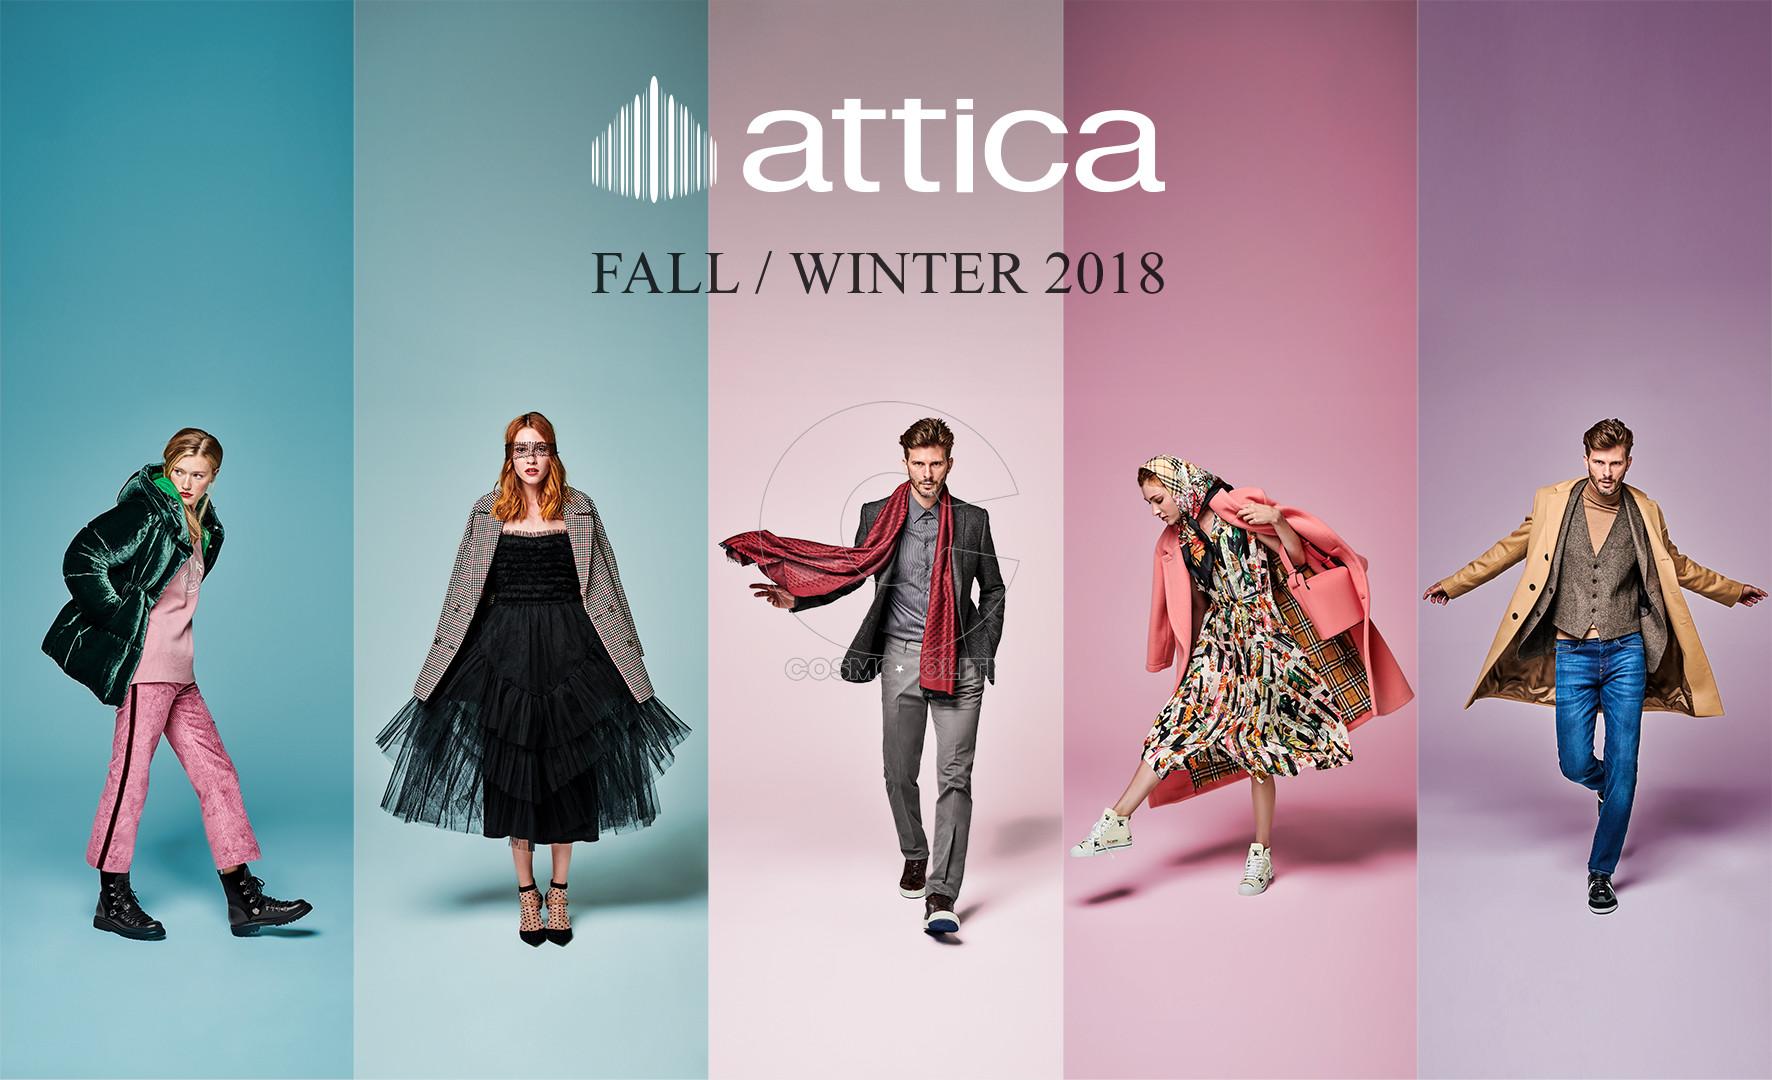 attica FW 2018 Collections